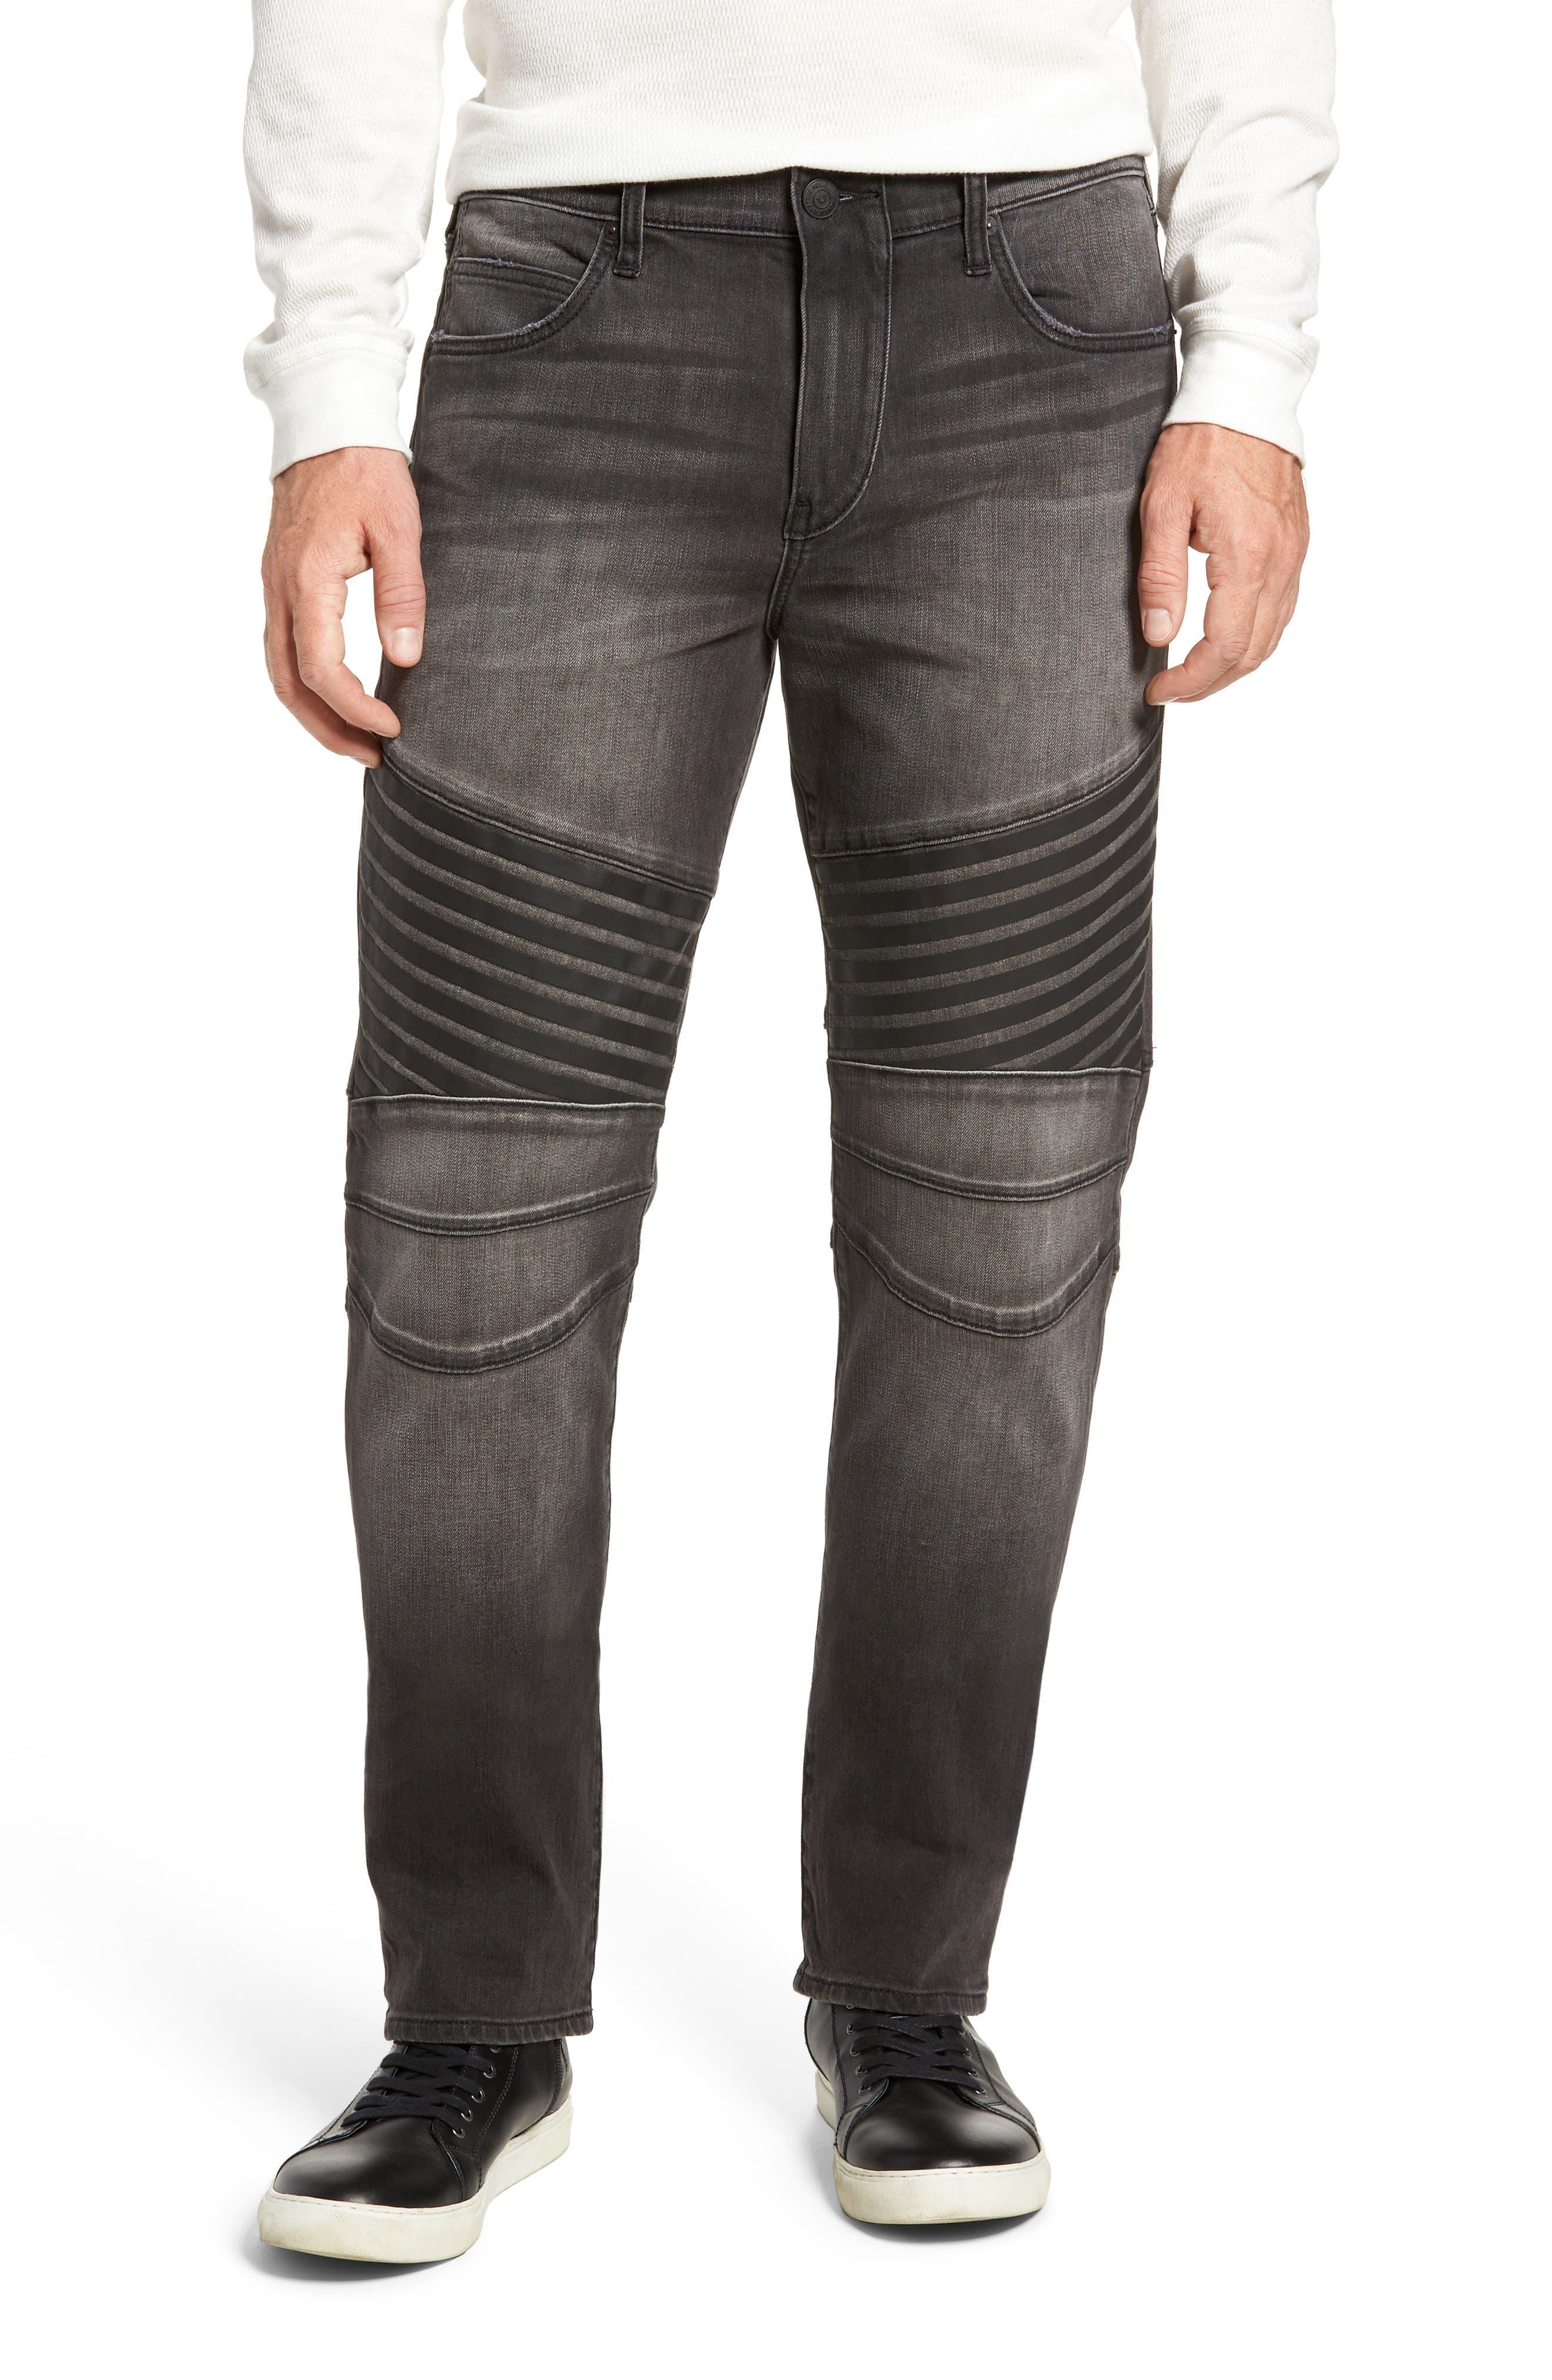 Geno Straight Leg Jeans,                             Main thumbnail 1, color,                             DARK REBEL RACE